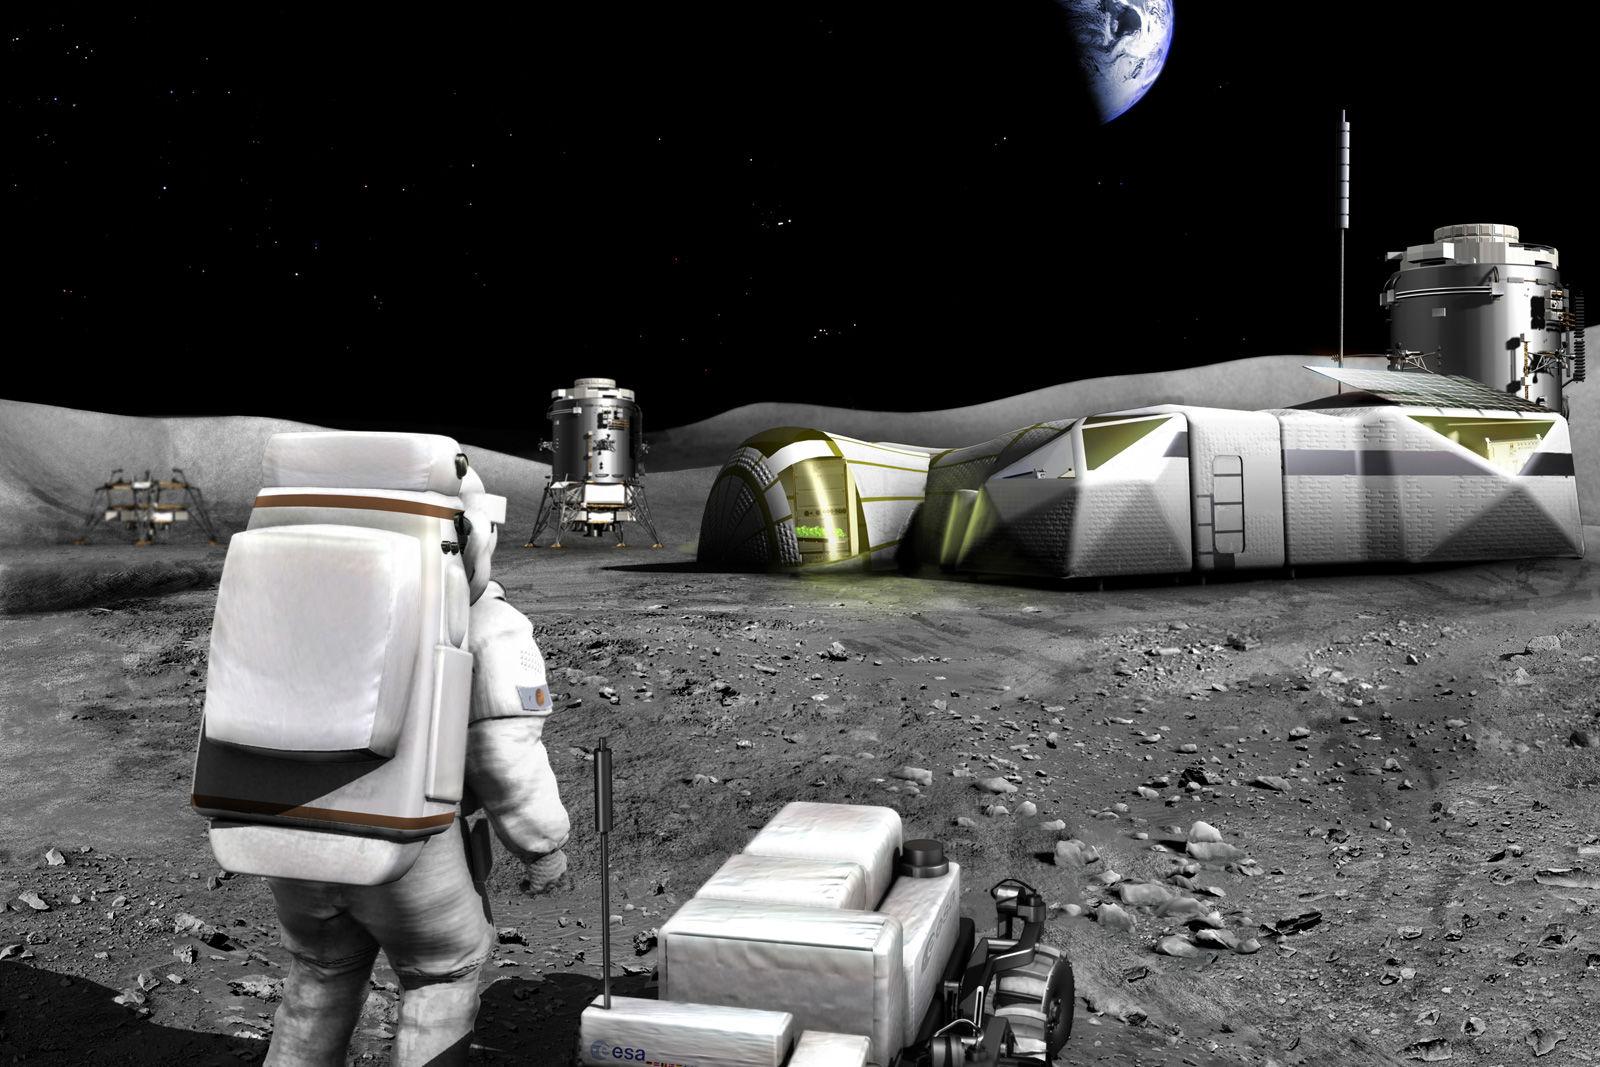 Moon habitat